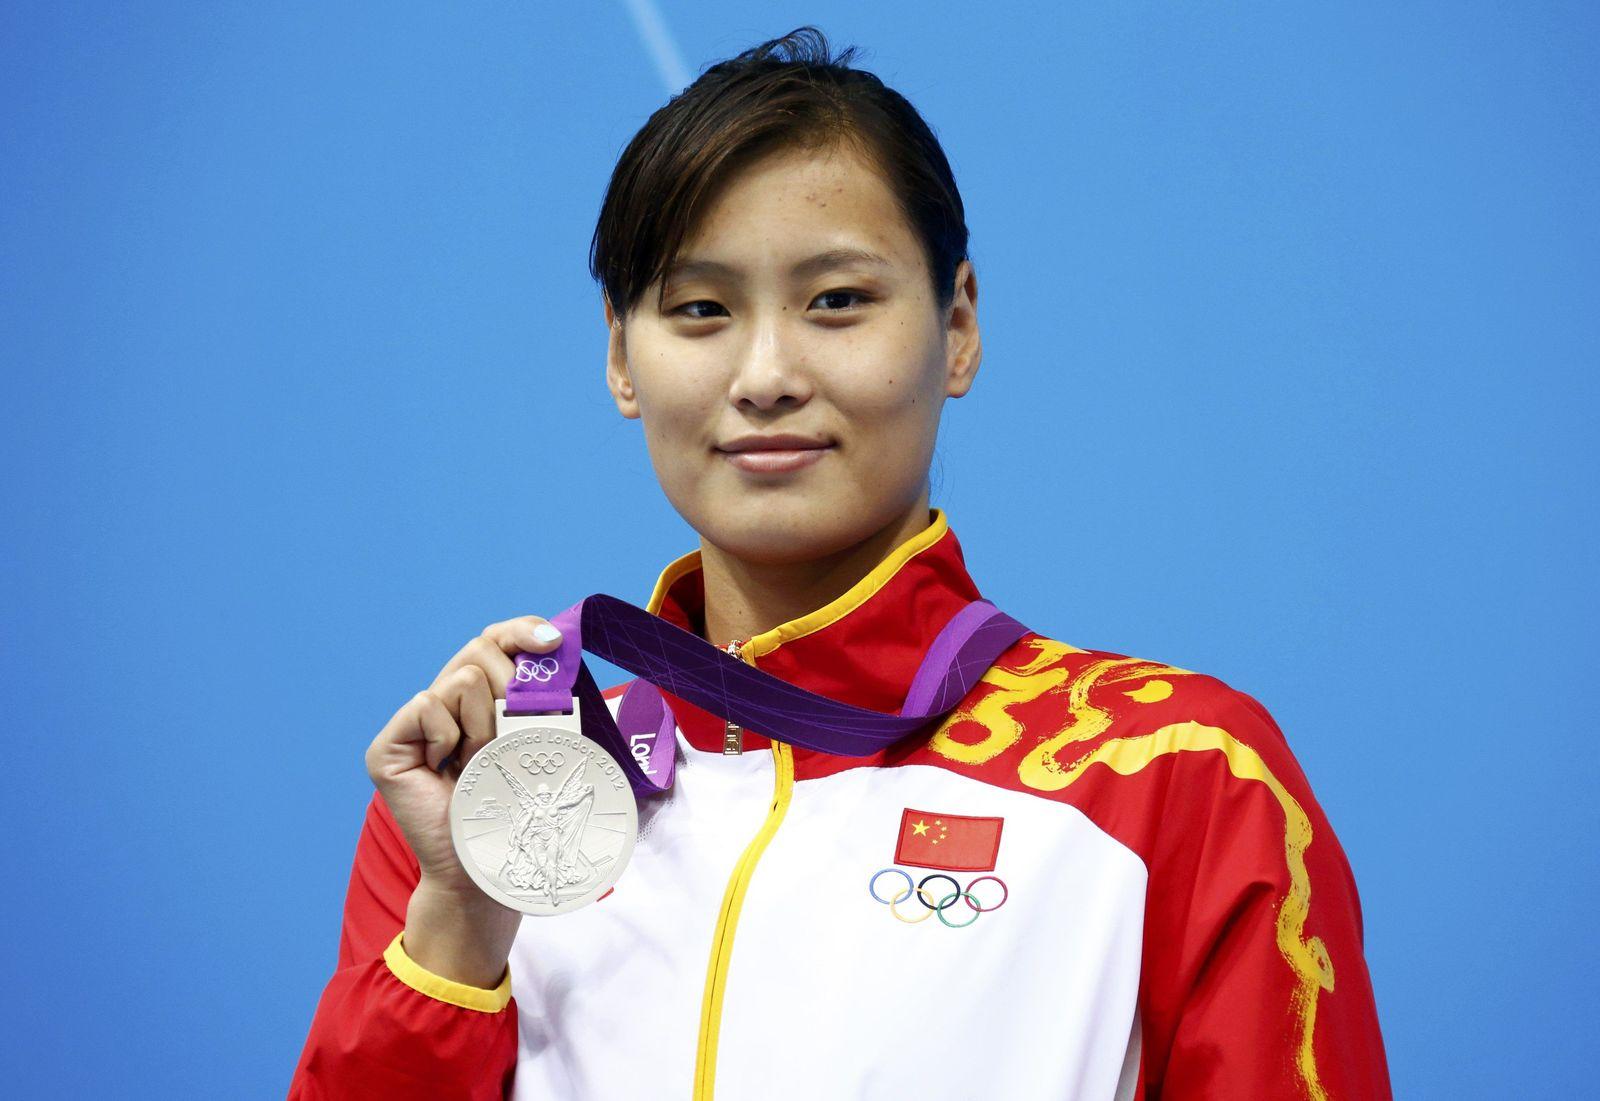 Lu Ying Silbermedaille